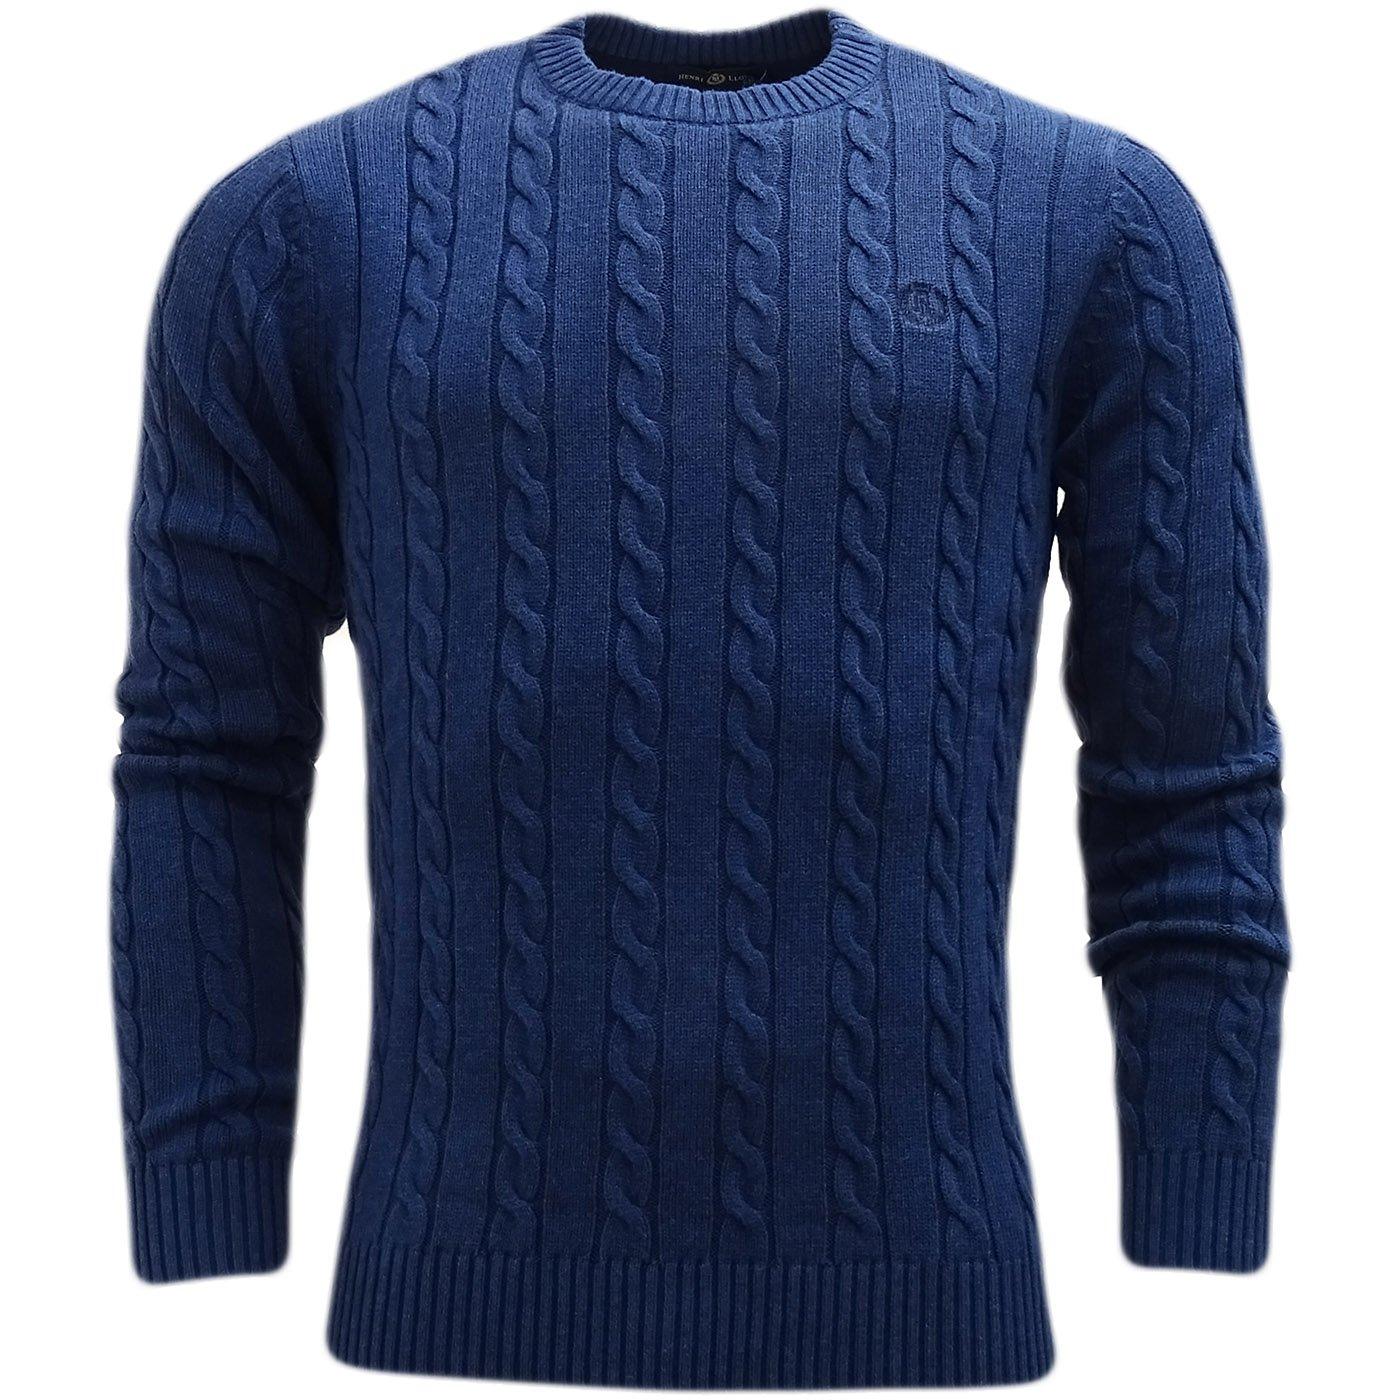 Henri Lloyd Cable Knitwear Jumper - Kramer Navy L